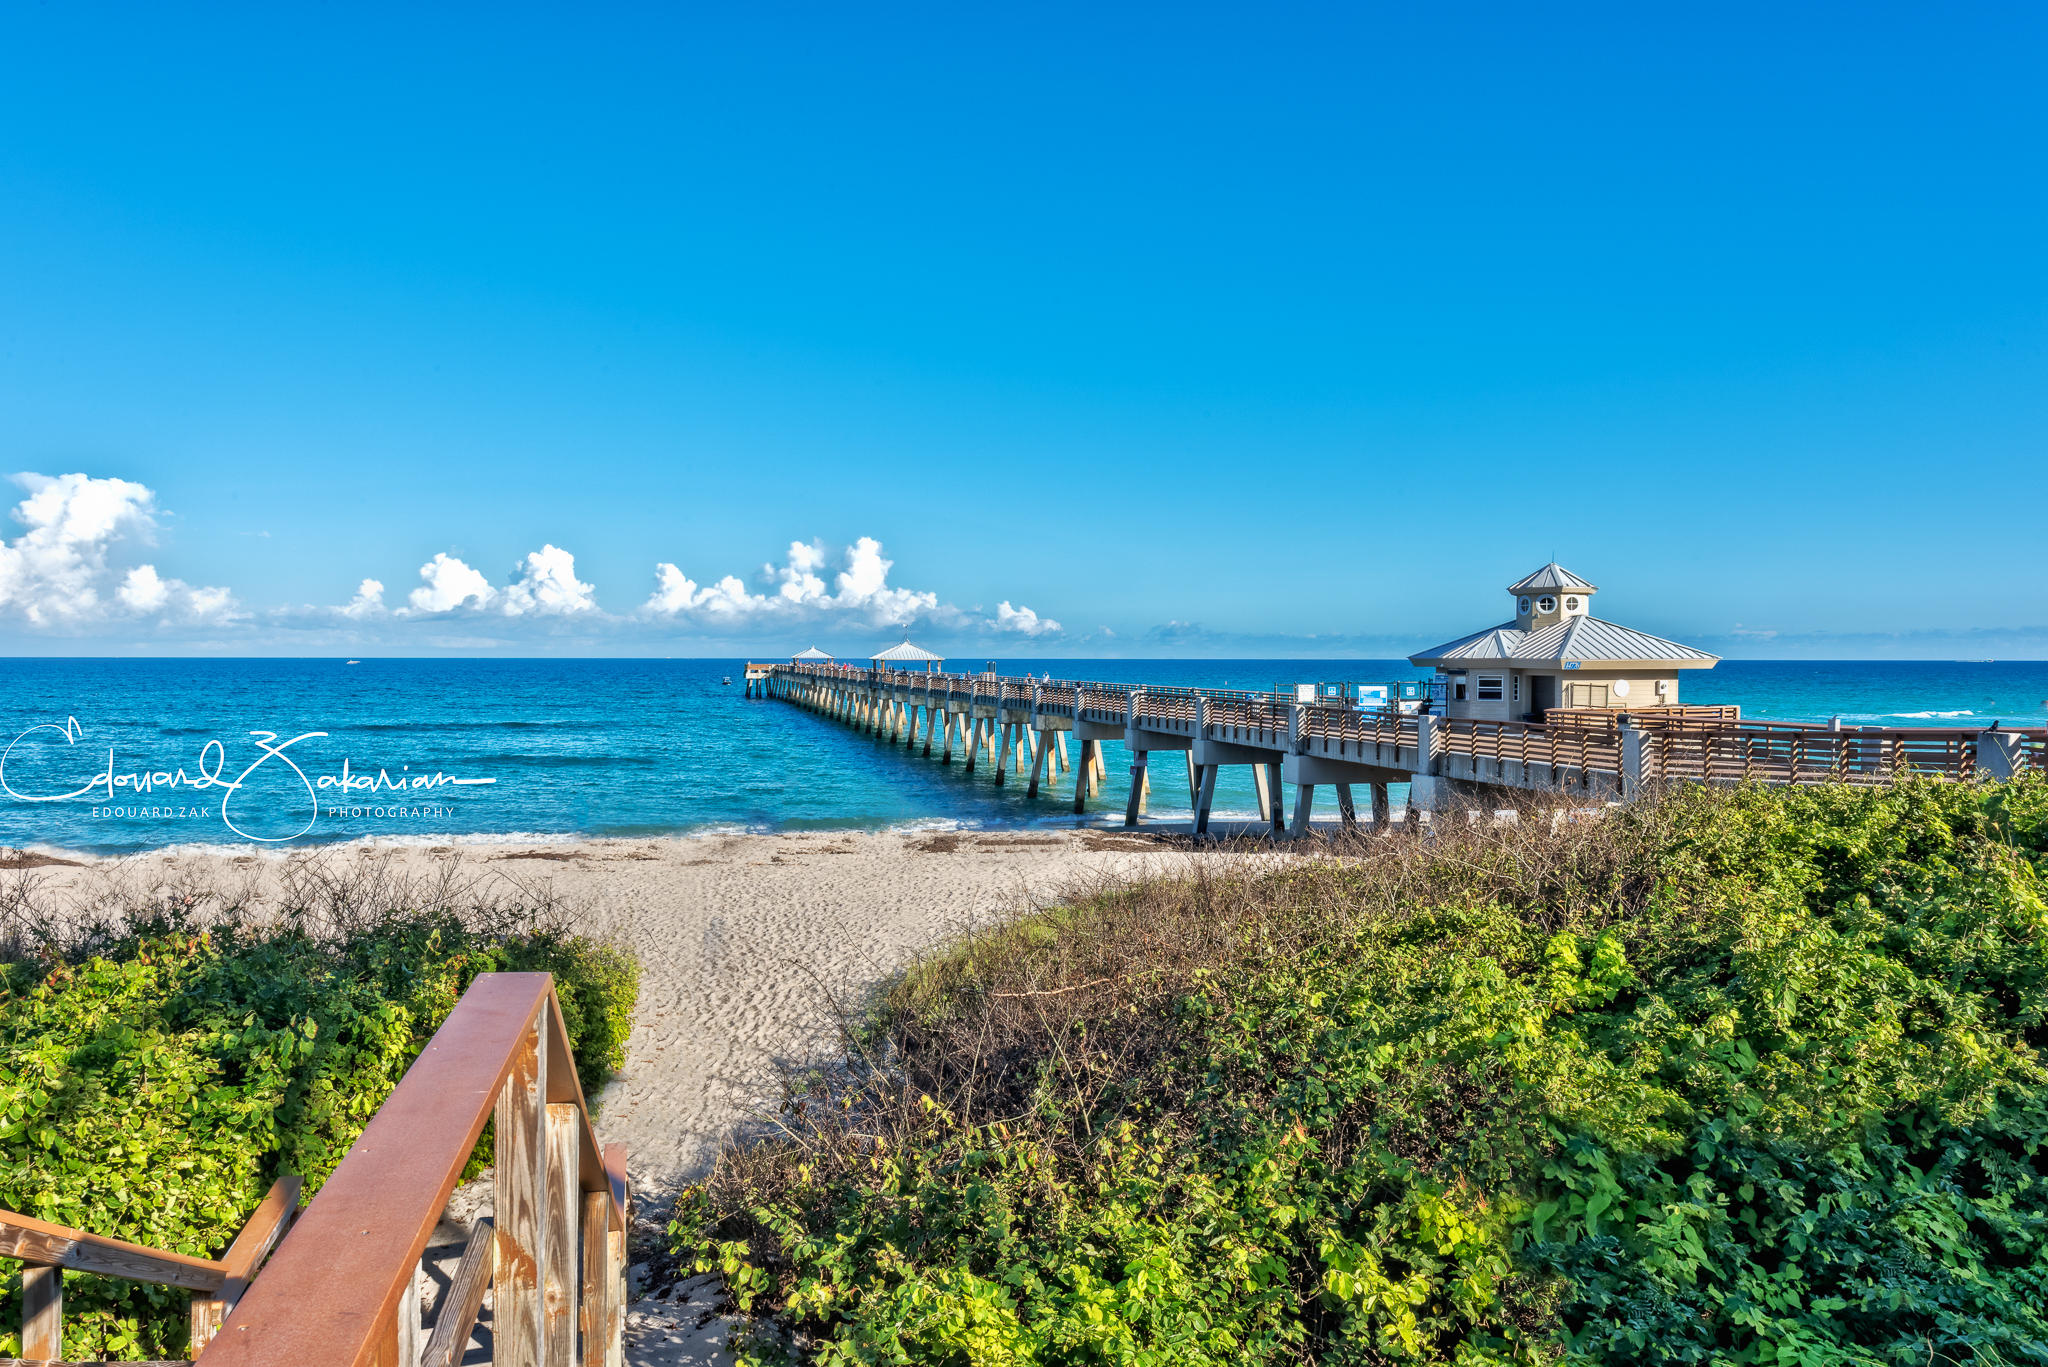 GARDENIA ISLES PALM BEACH GARDENS FLORIDA